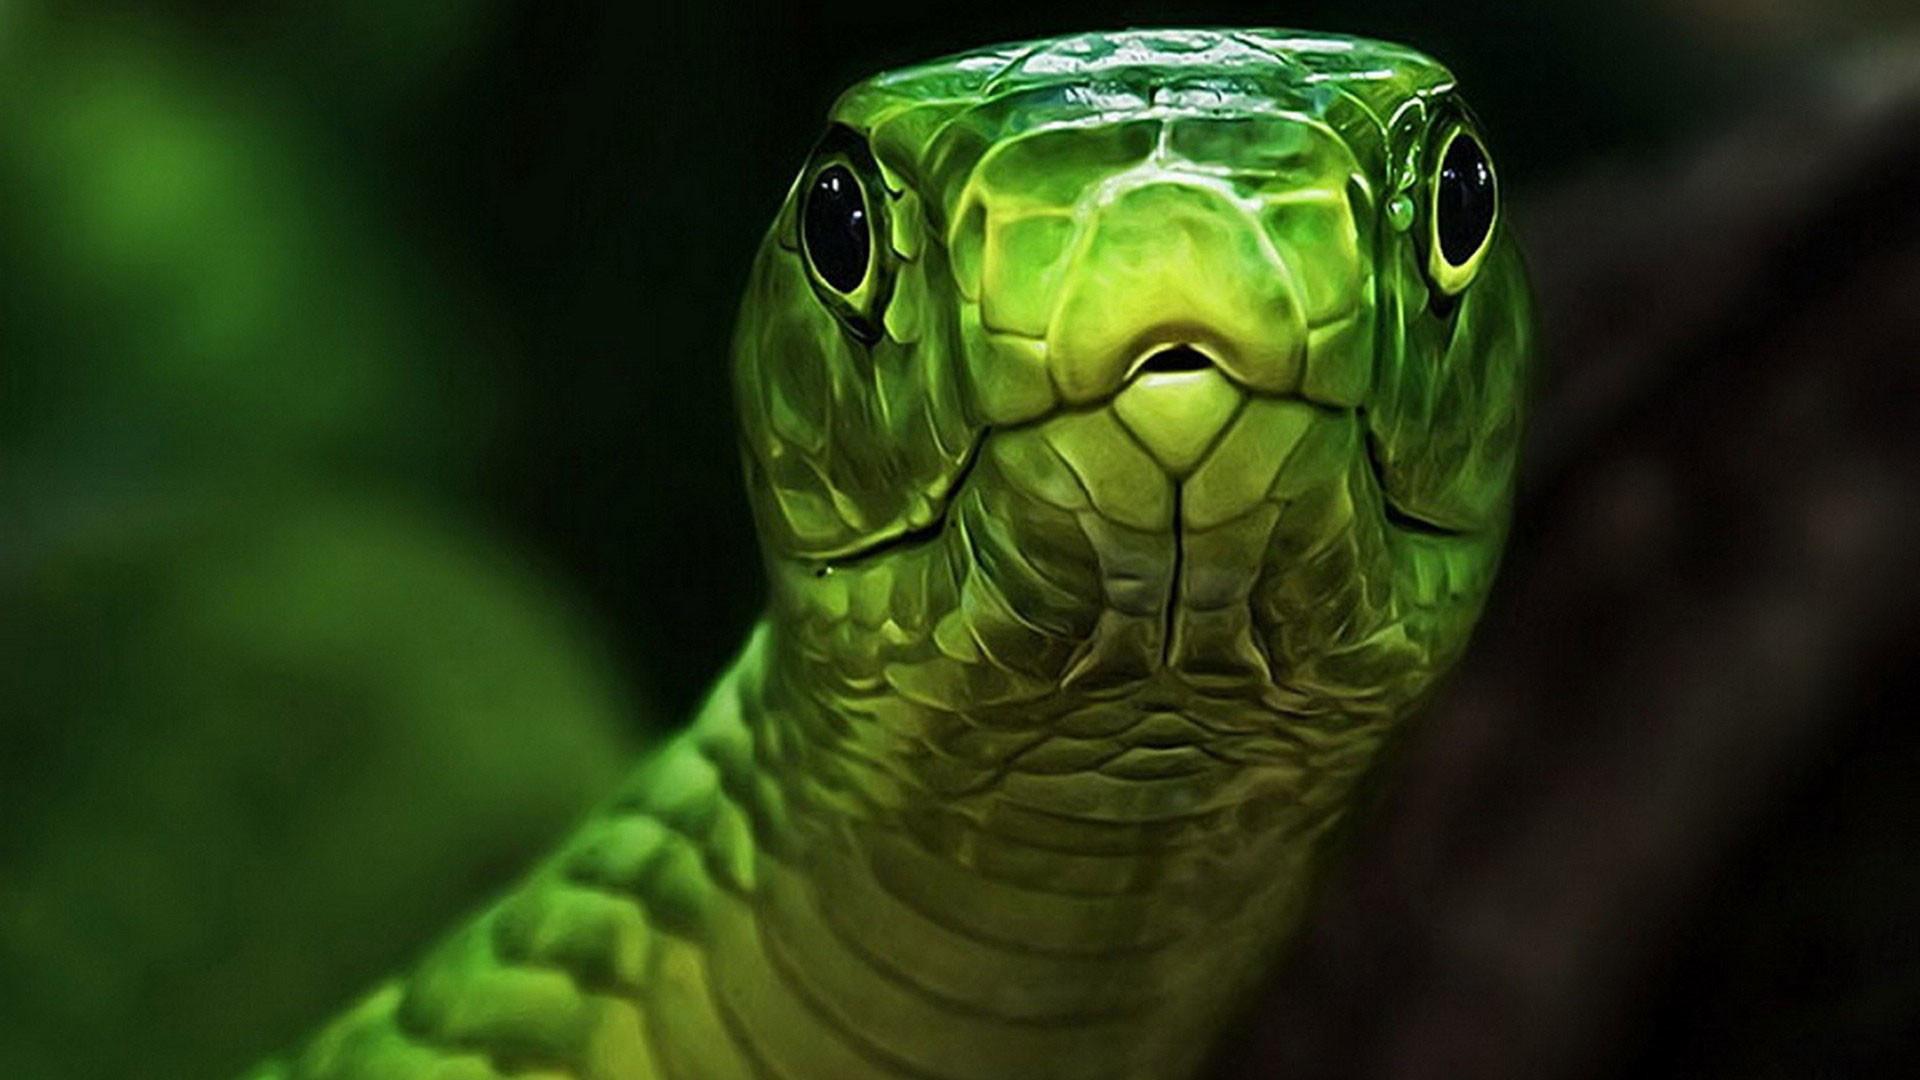 hd-pics-photos-green-snake-reptiles-nature-animals-